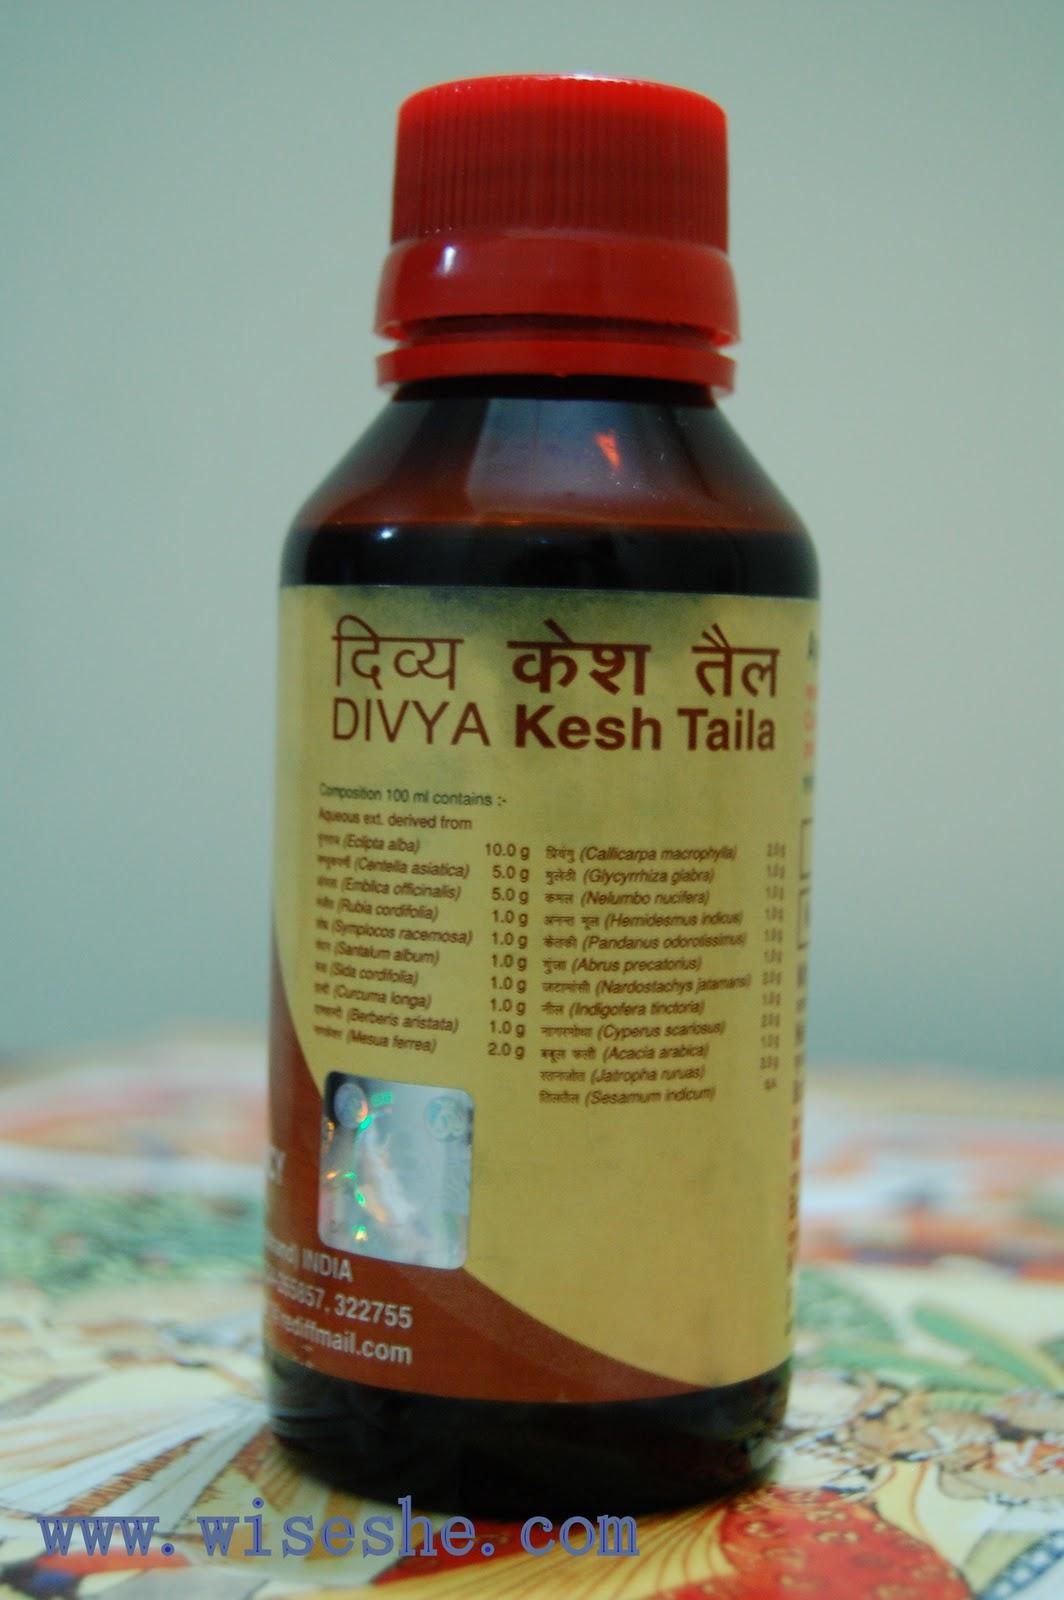 Divya Kesh Tel Hair Oil For Loss